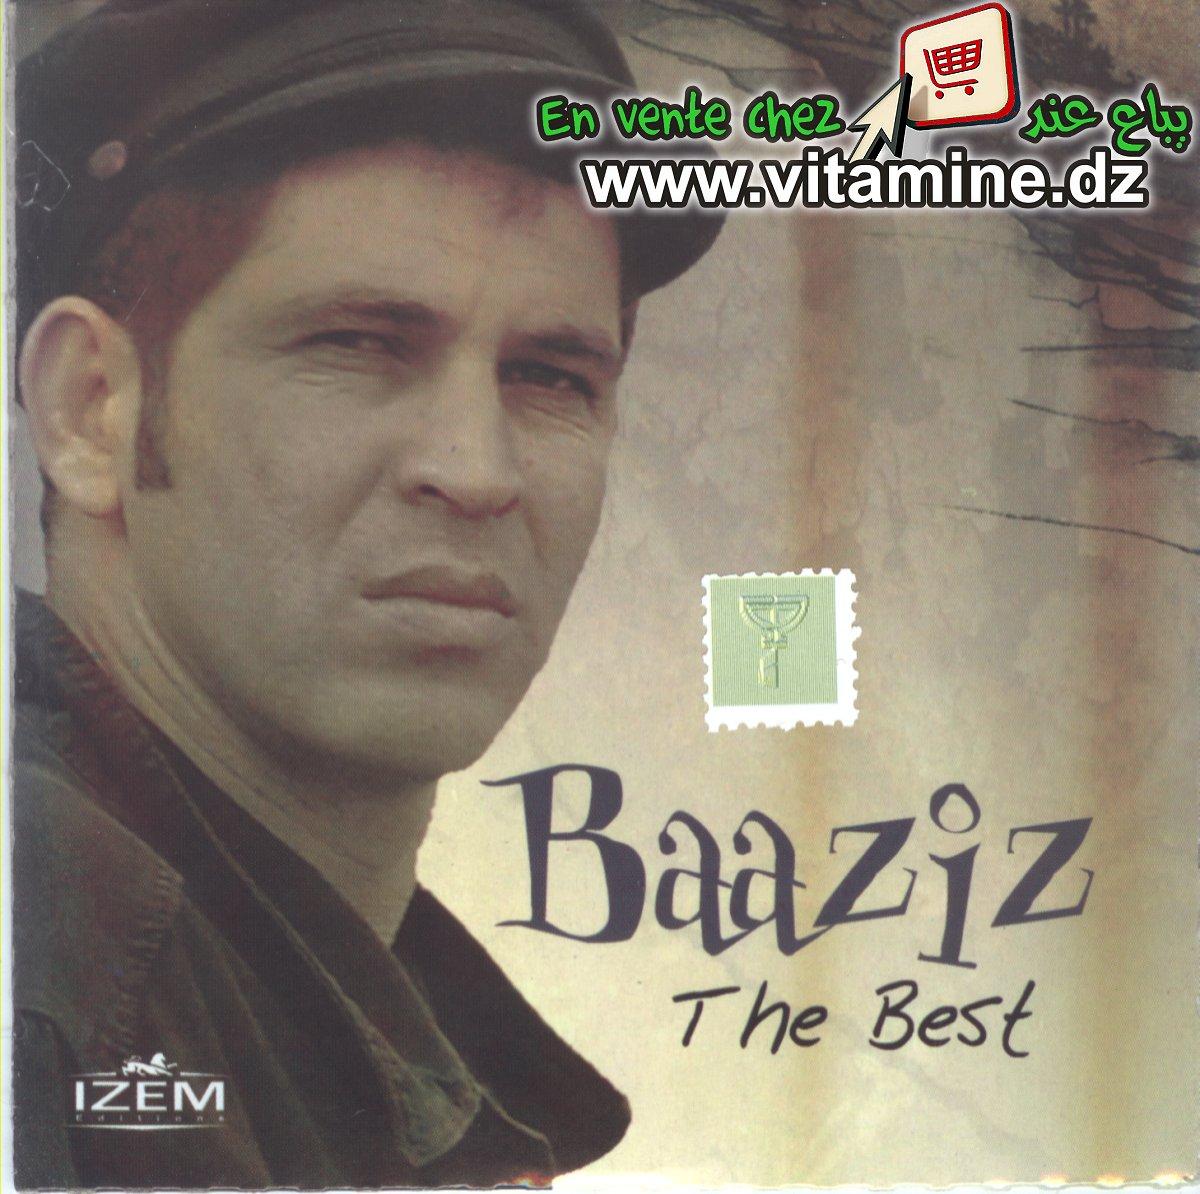 Baaziz - The best